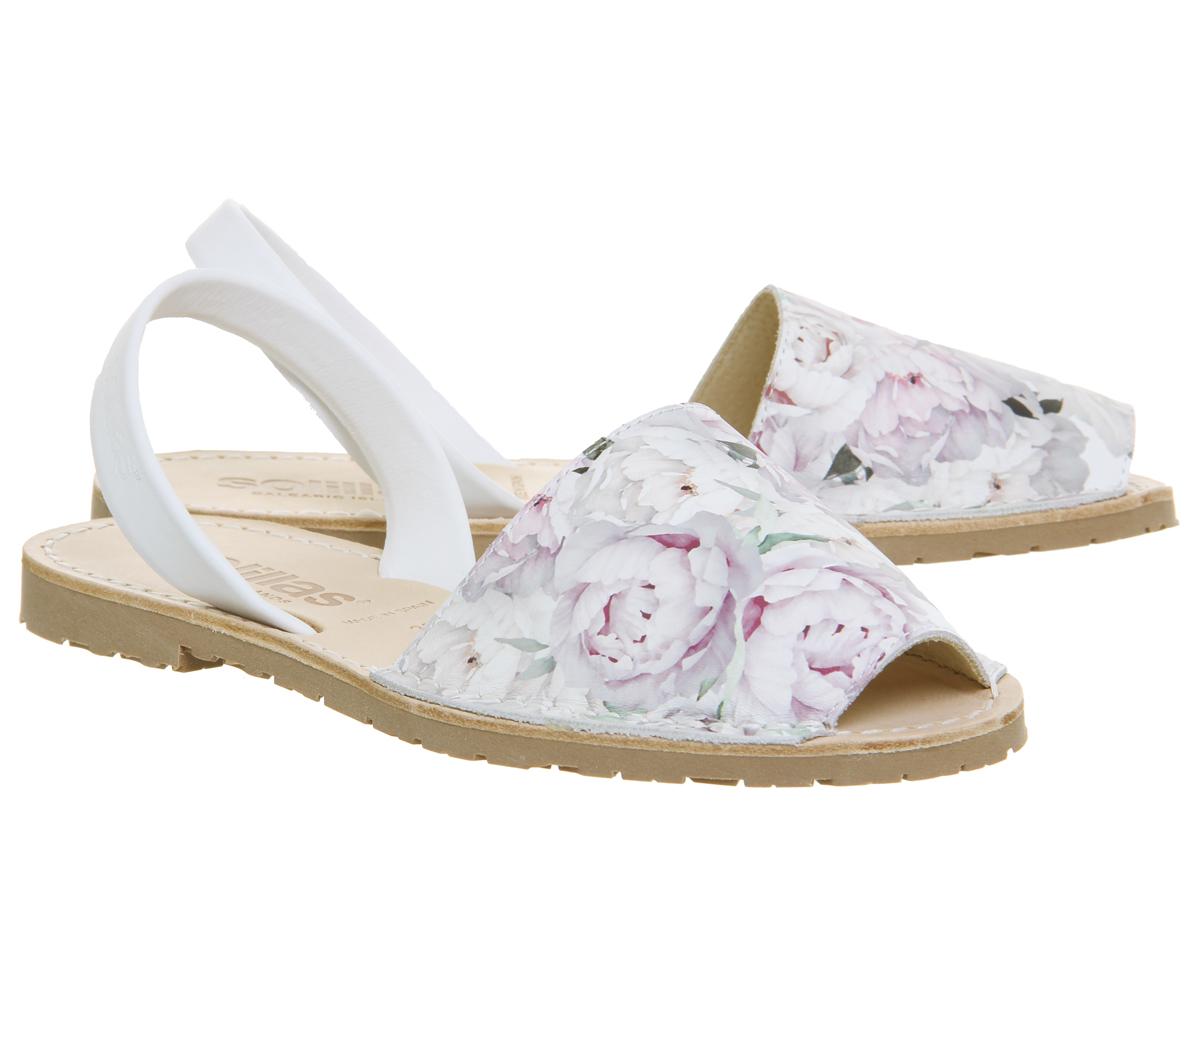 6f9b5077fbbc Womens Solillas Solillas Sandals Floral Print Sandals